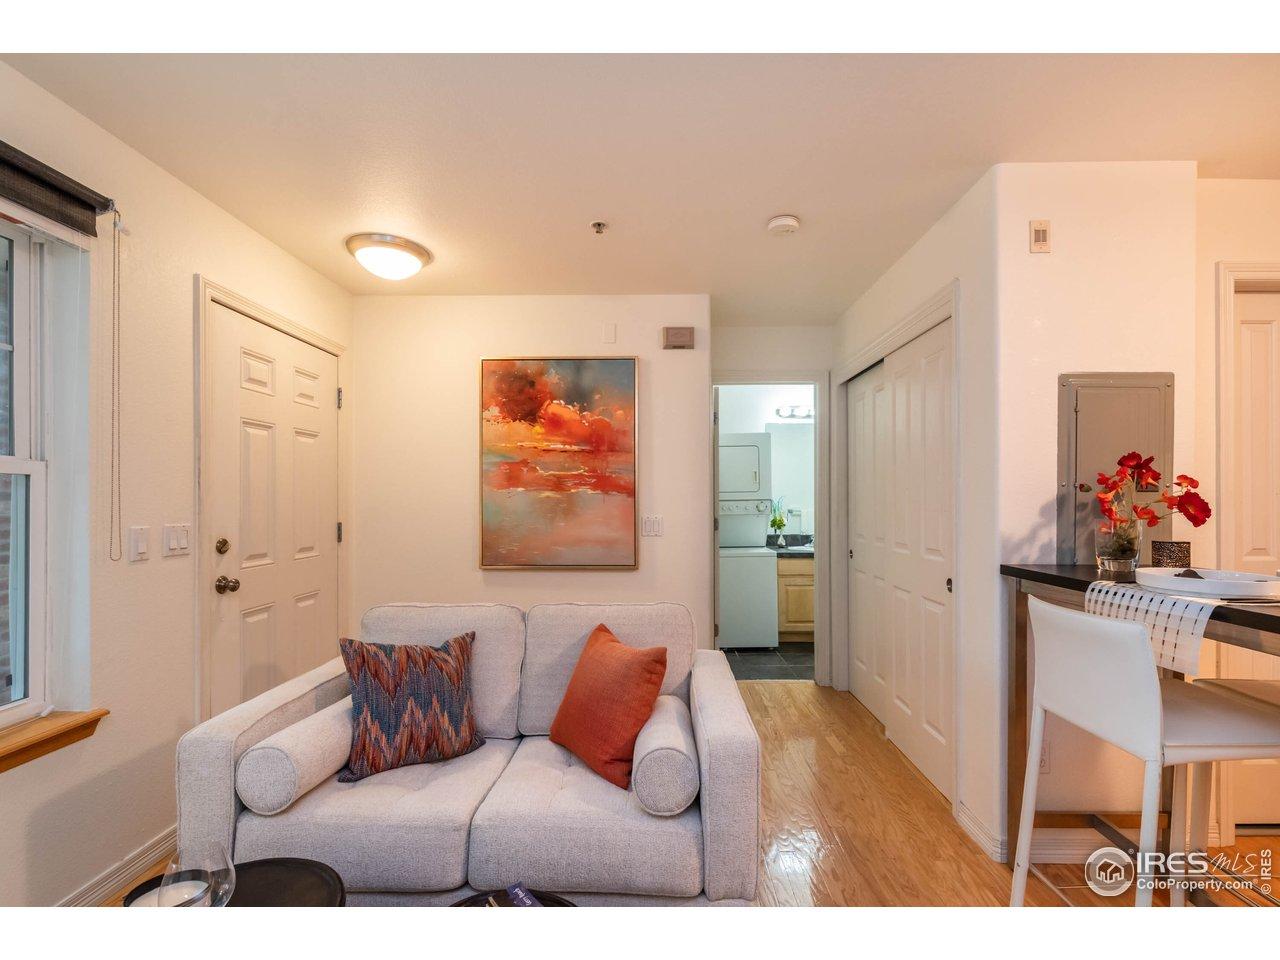 Living Room Area w/ Excellent Closet Space